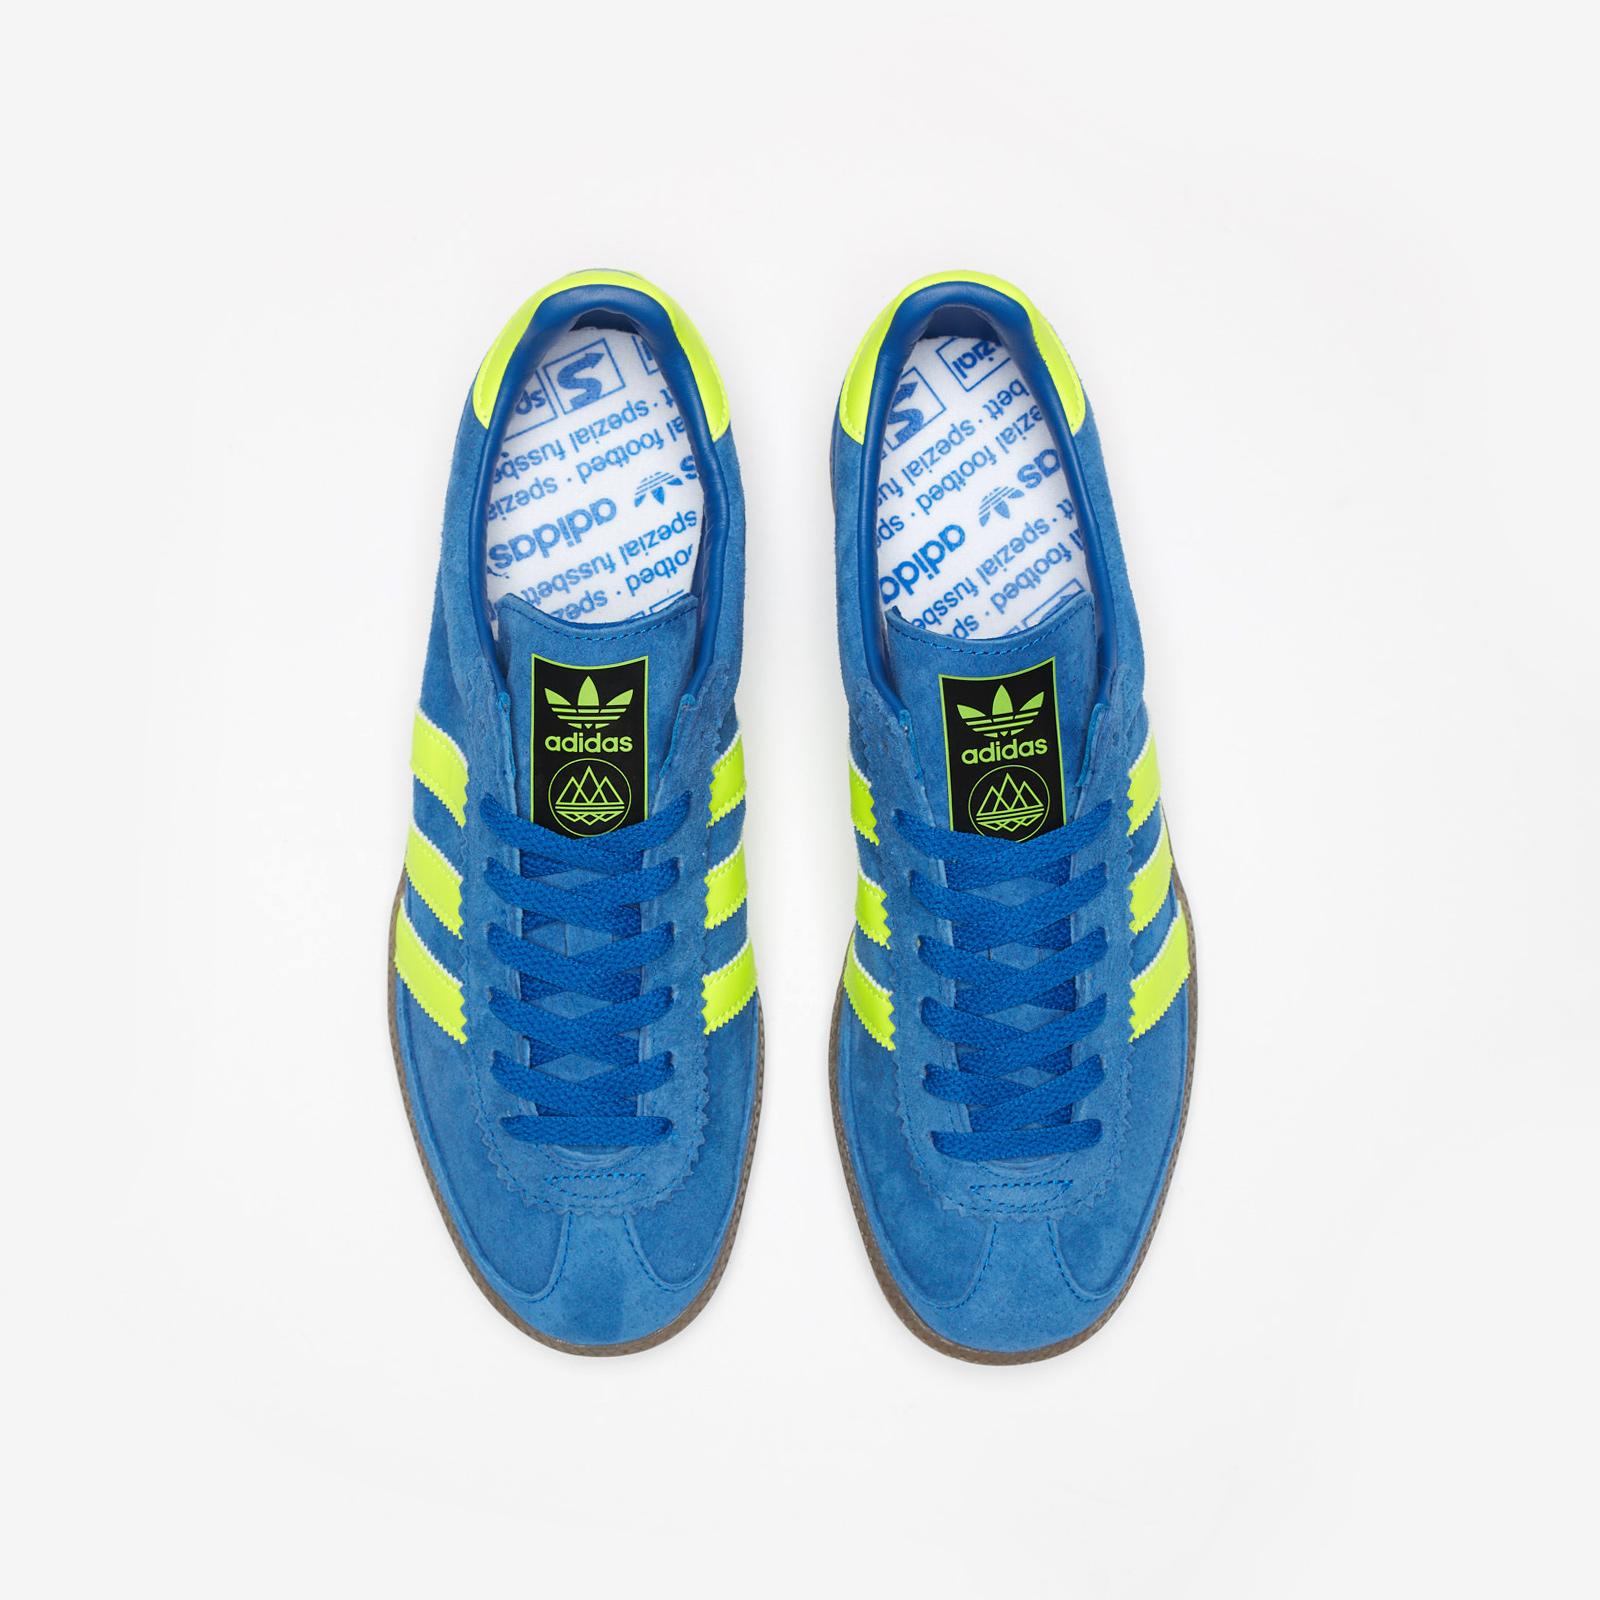 adidas Whalley - F35717